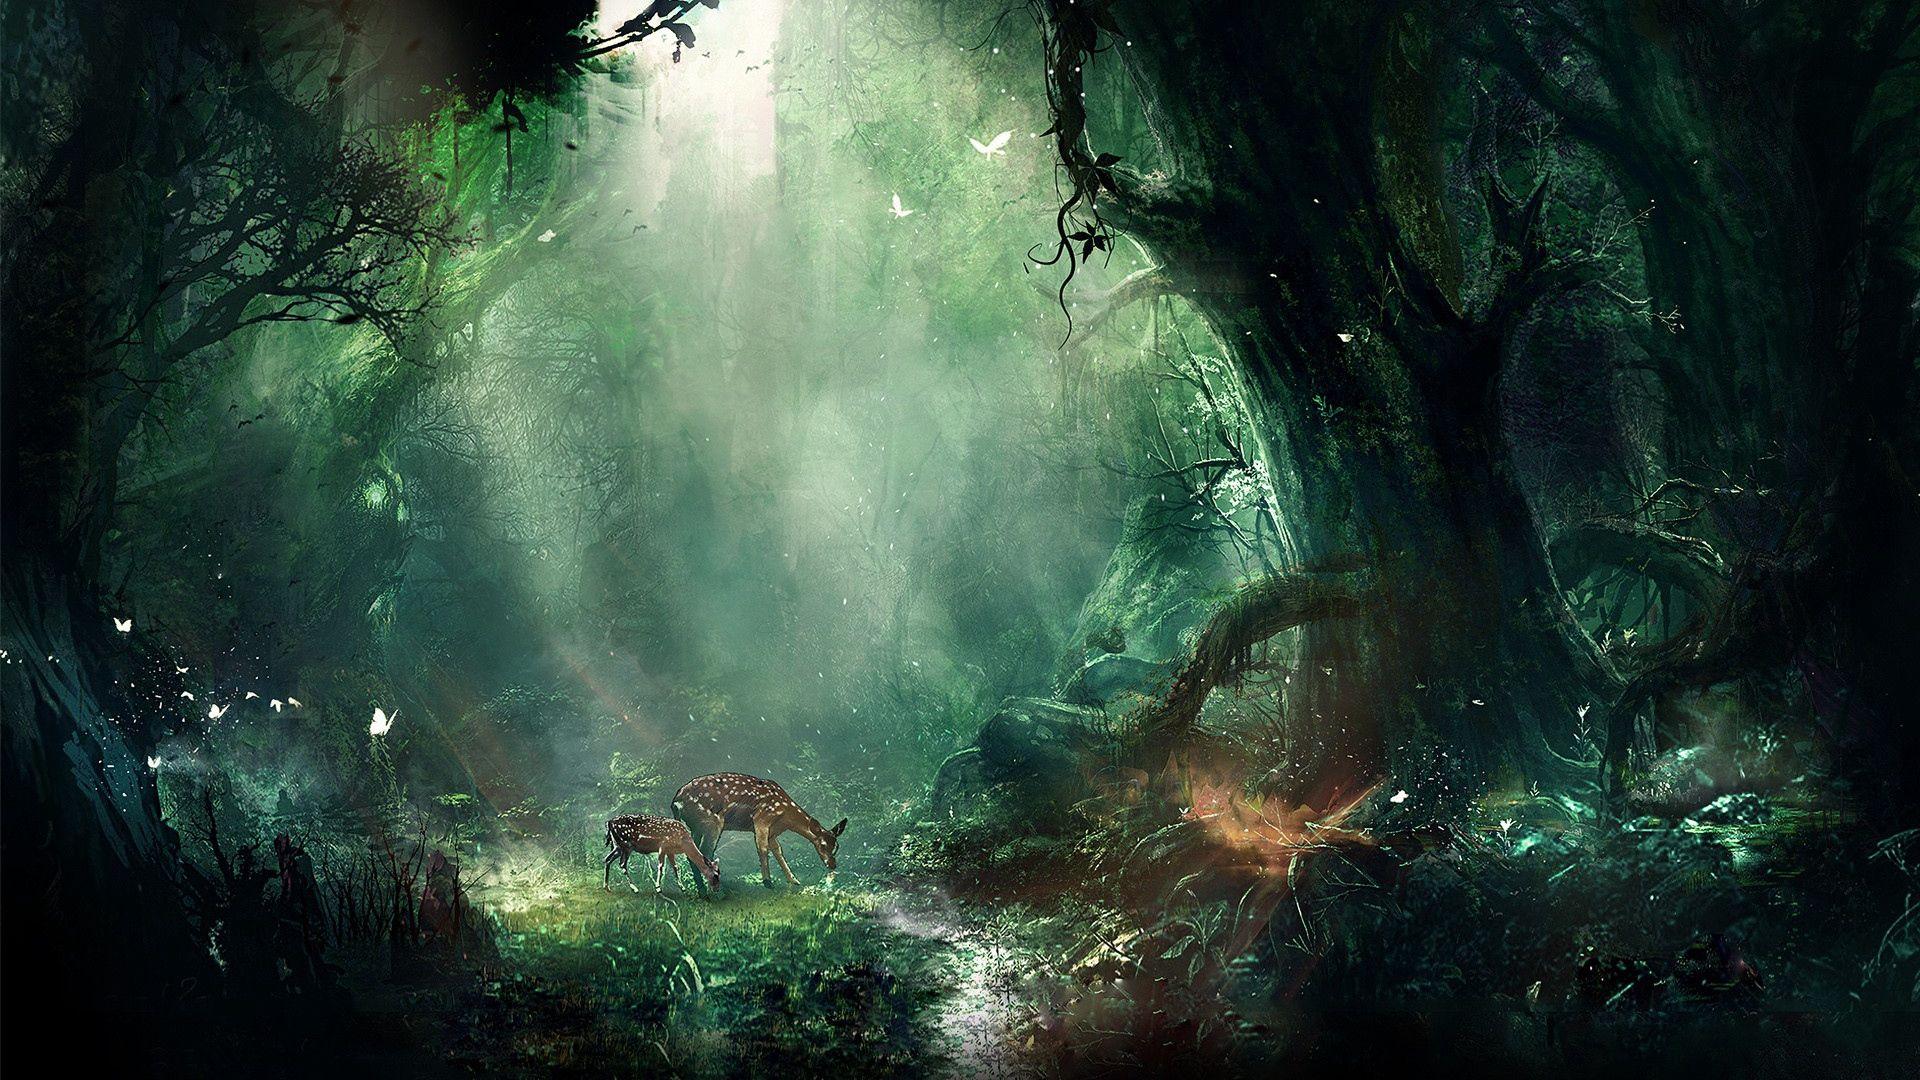 Digital Art Background wallpaper download